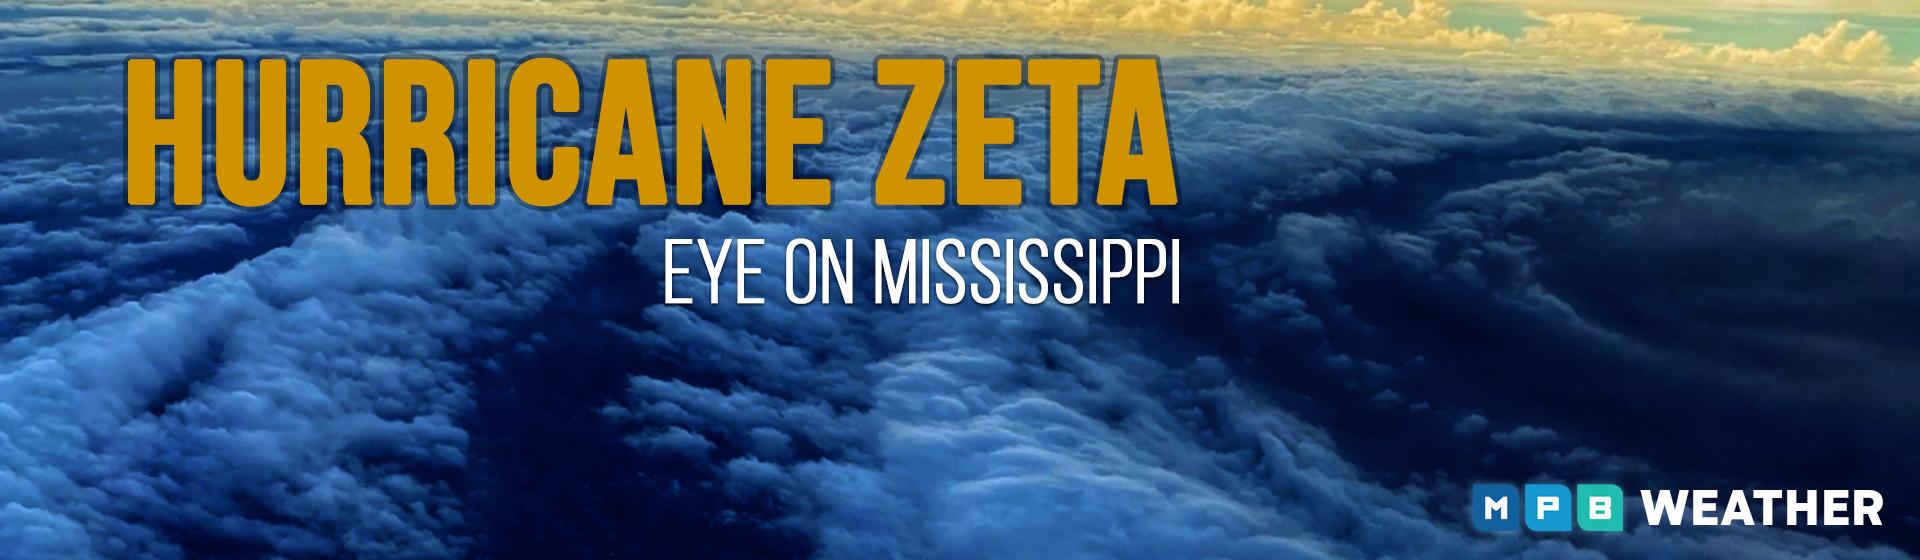 Hurricane Zeta graphic